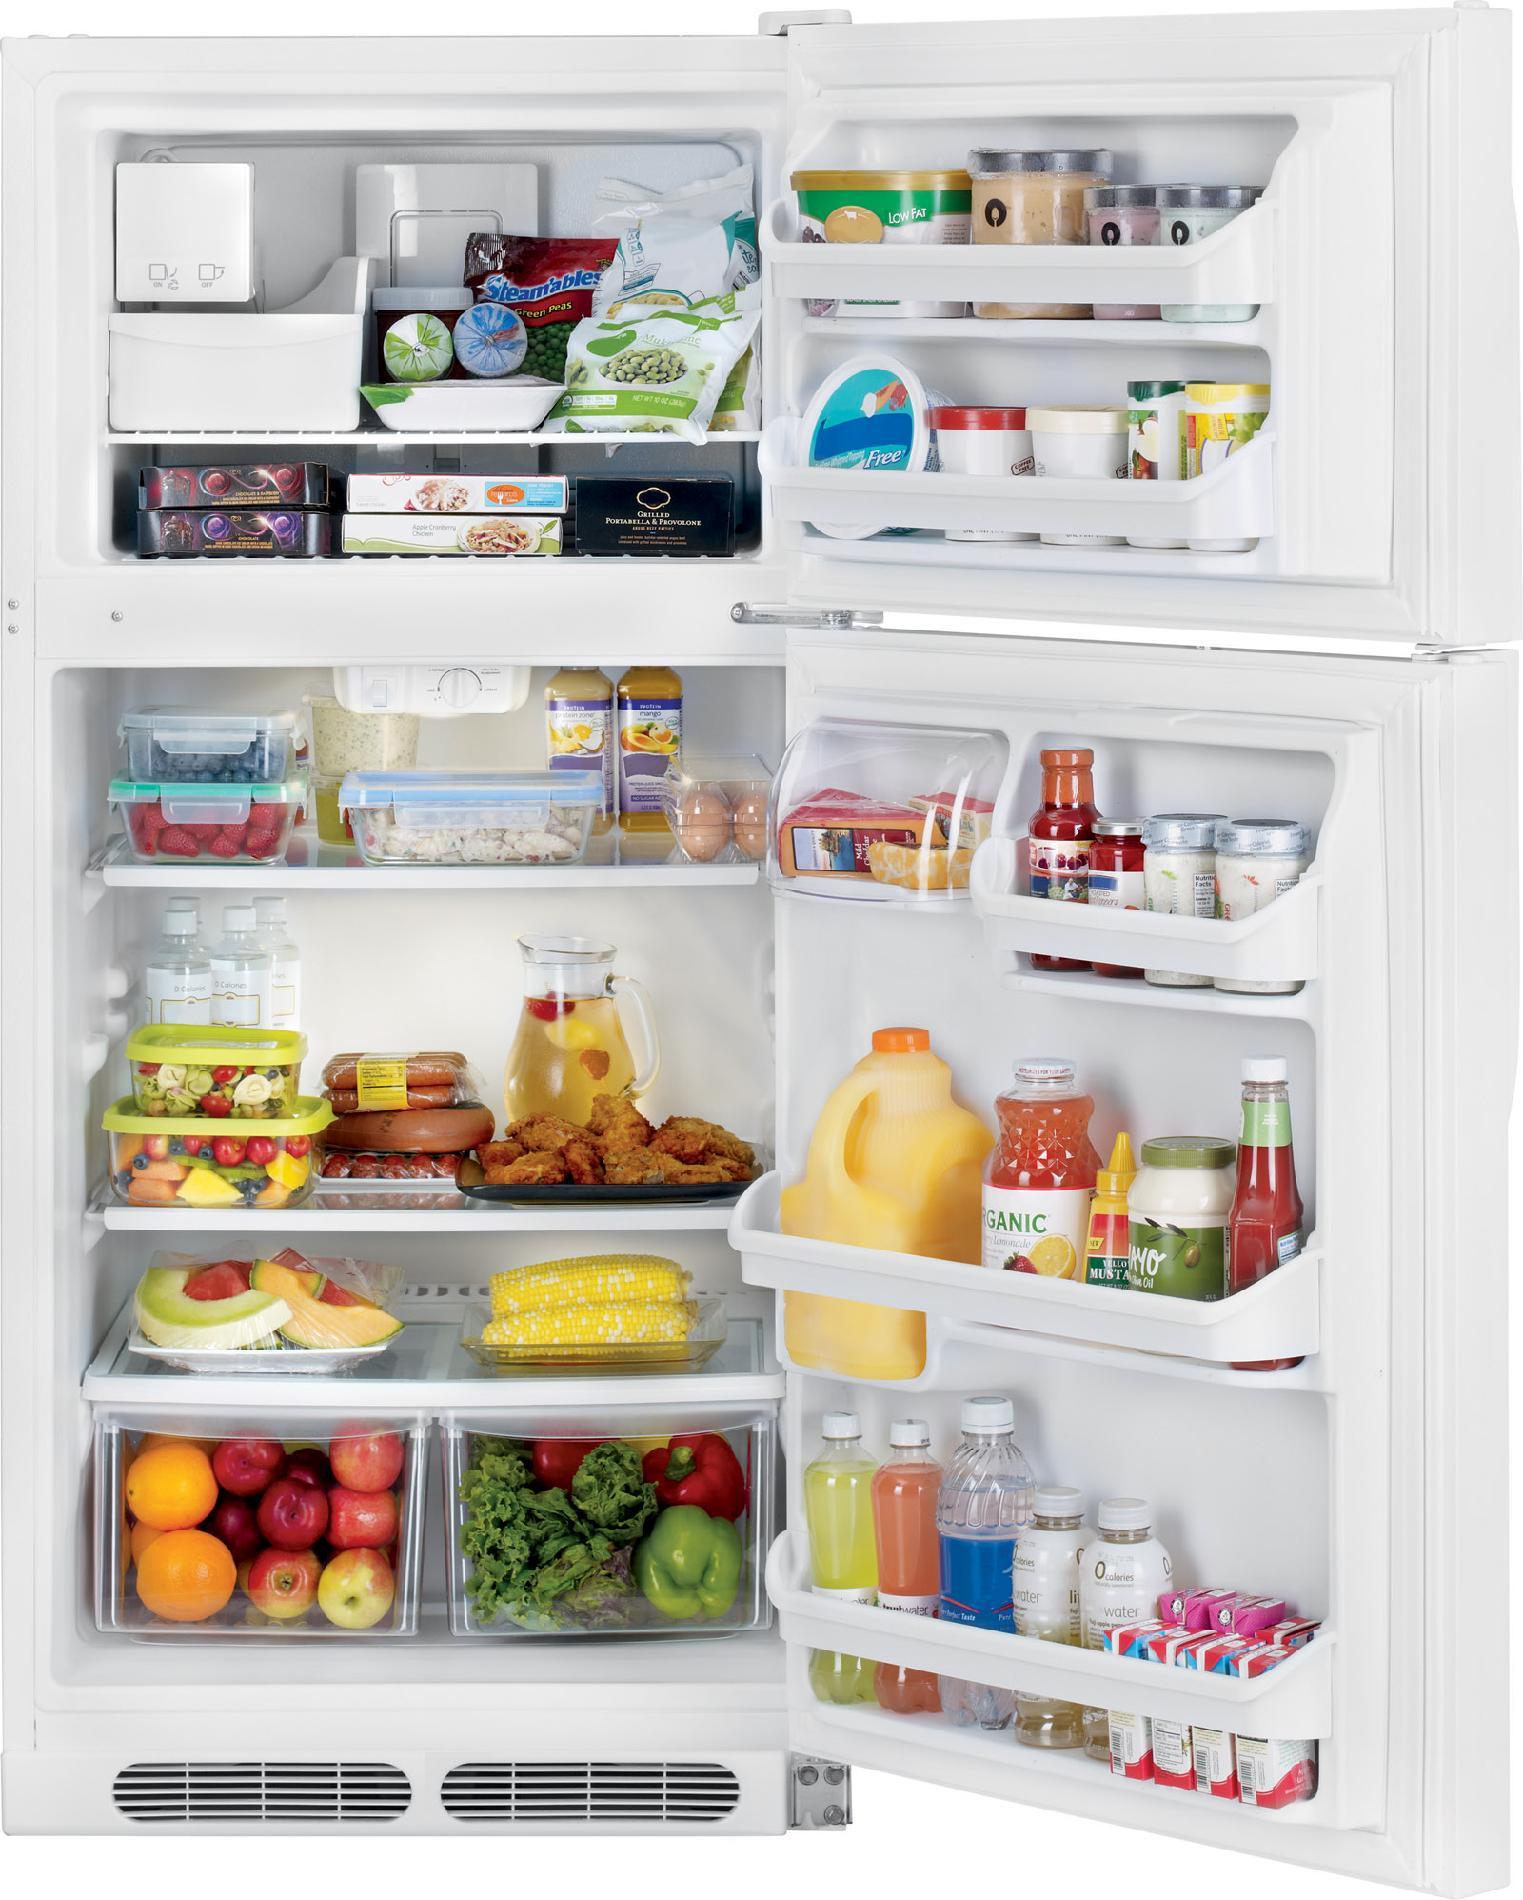 Kenmore 70302 14.5 cu. ft. Top Freezer Refrigerator - White